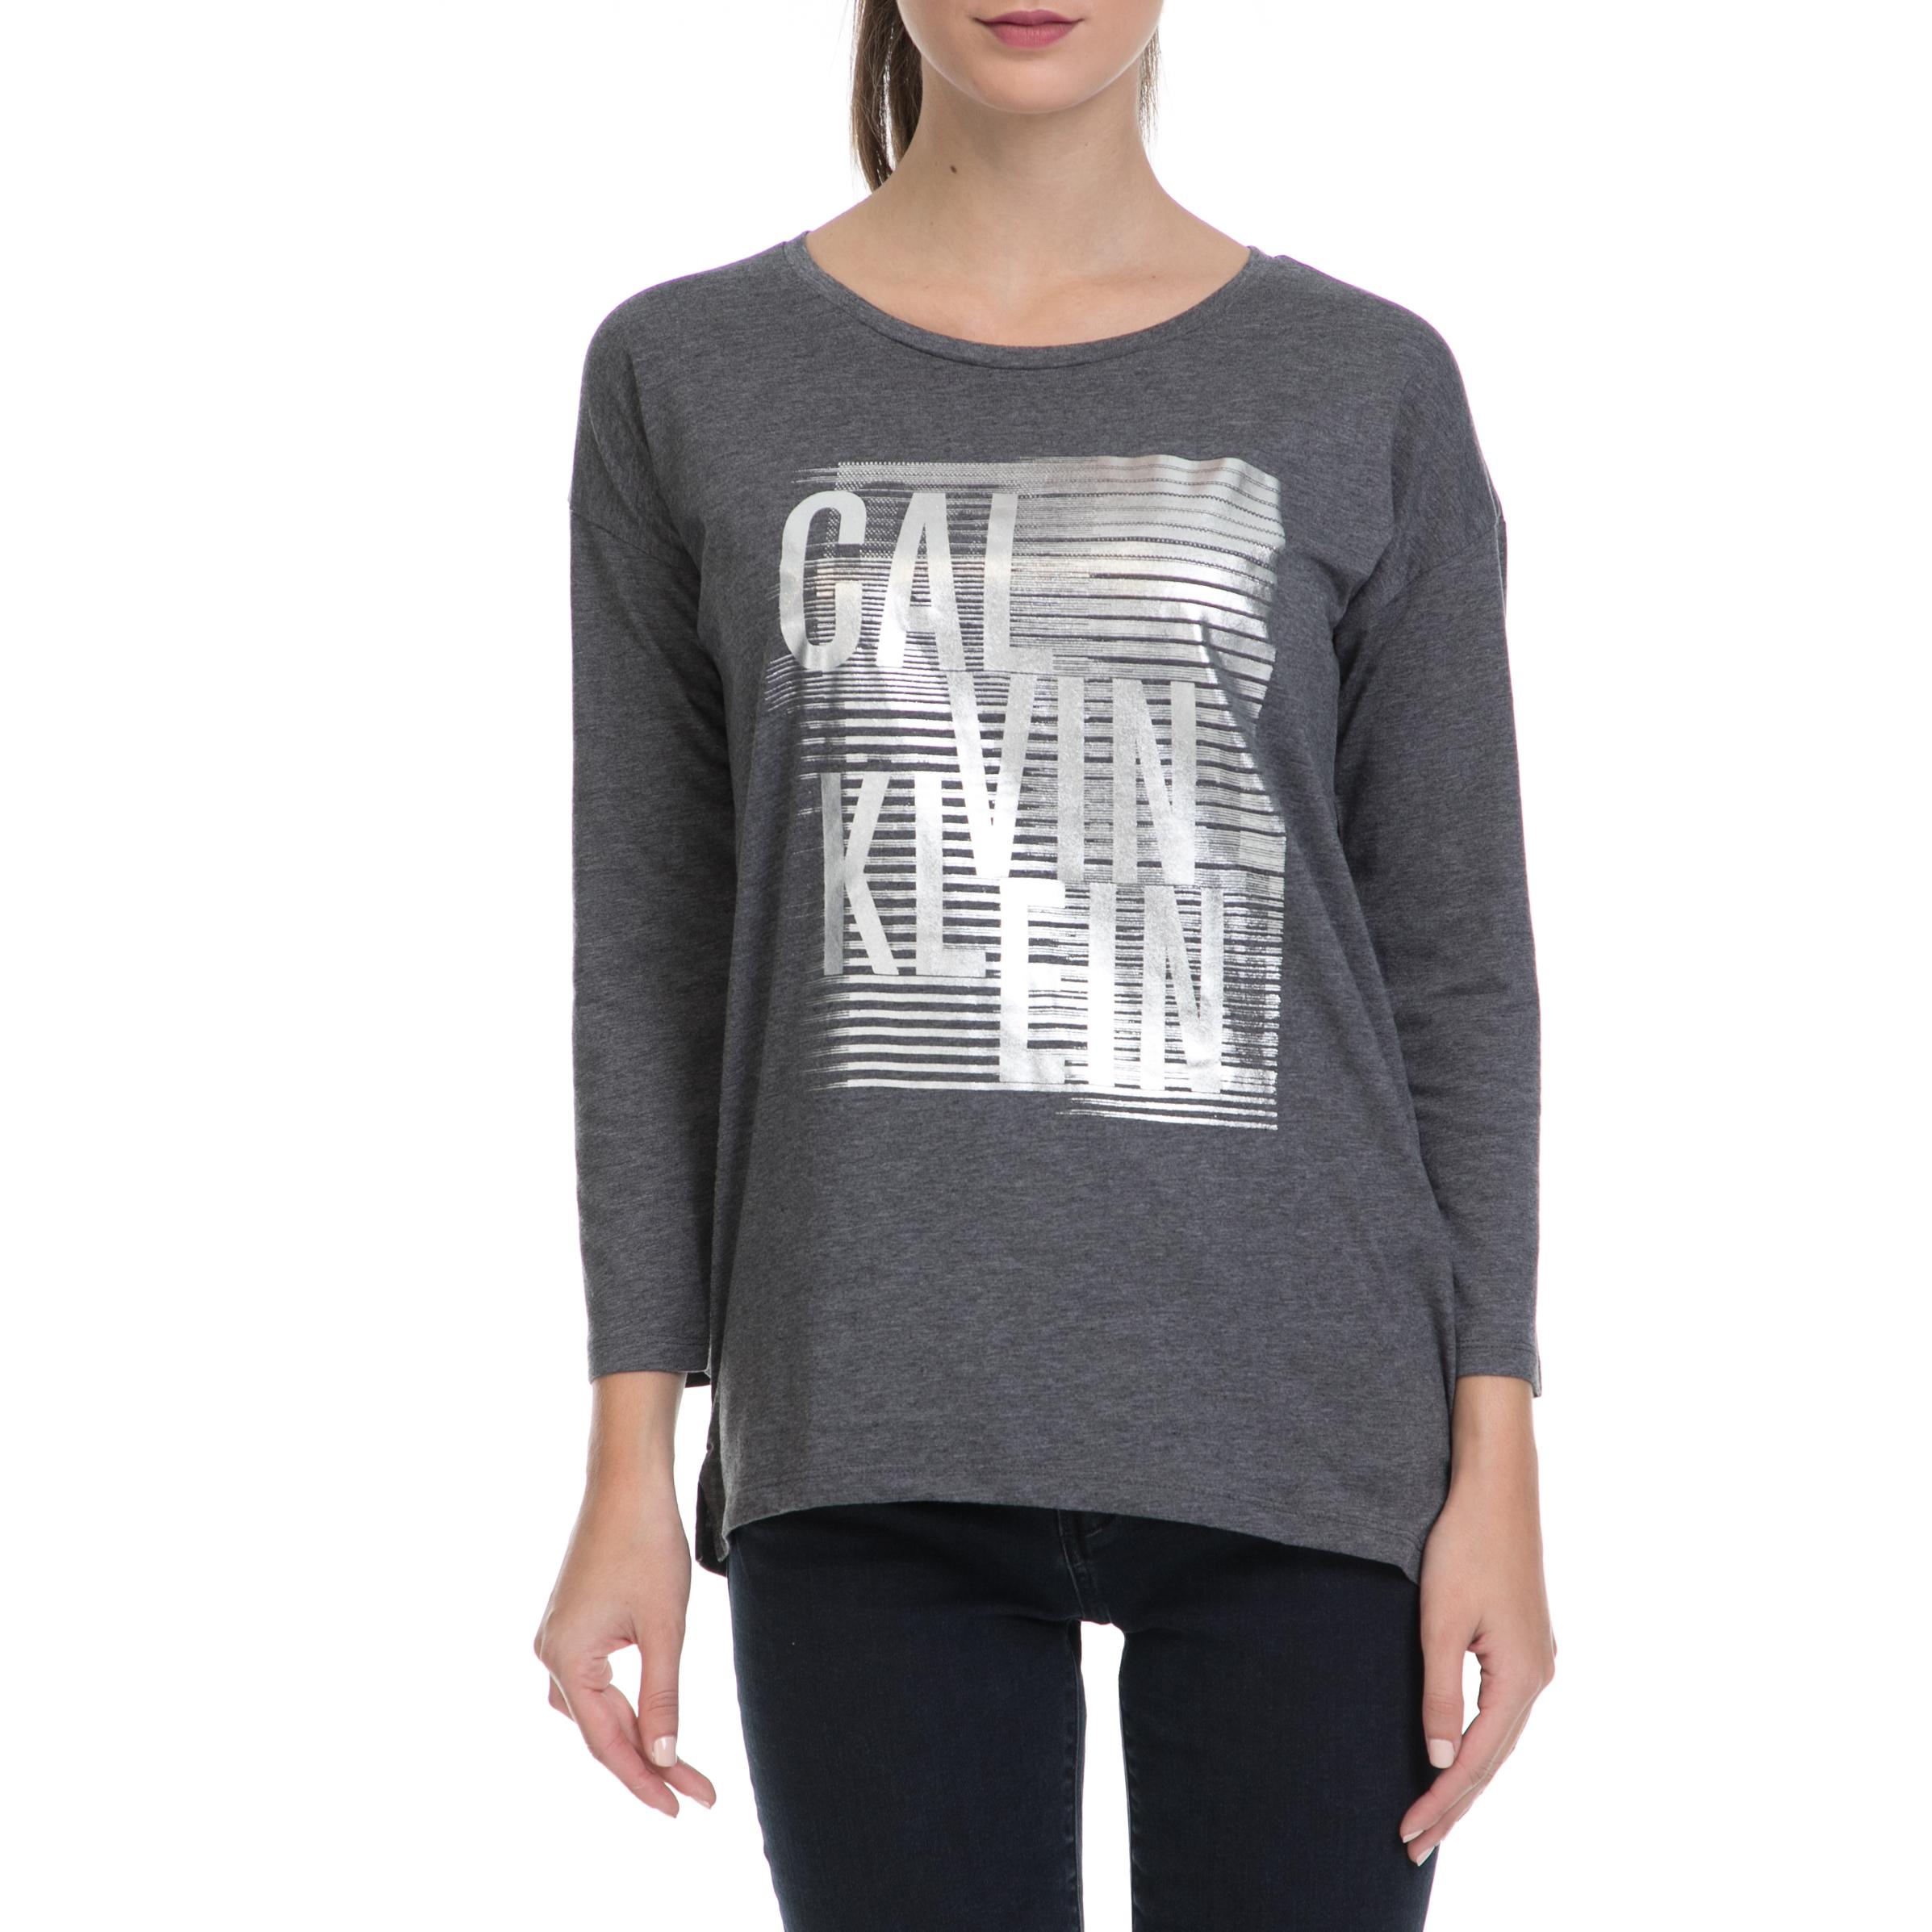 CALVIN KLEIN JEANS – Γυναικεία μπλούζα TRIX-9 CN LWK γκρι